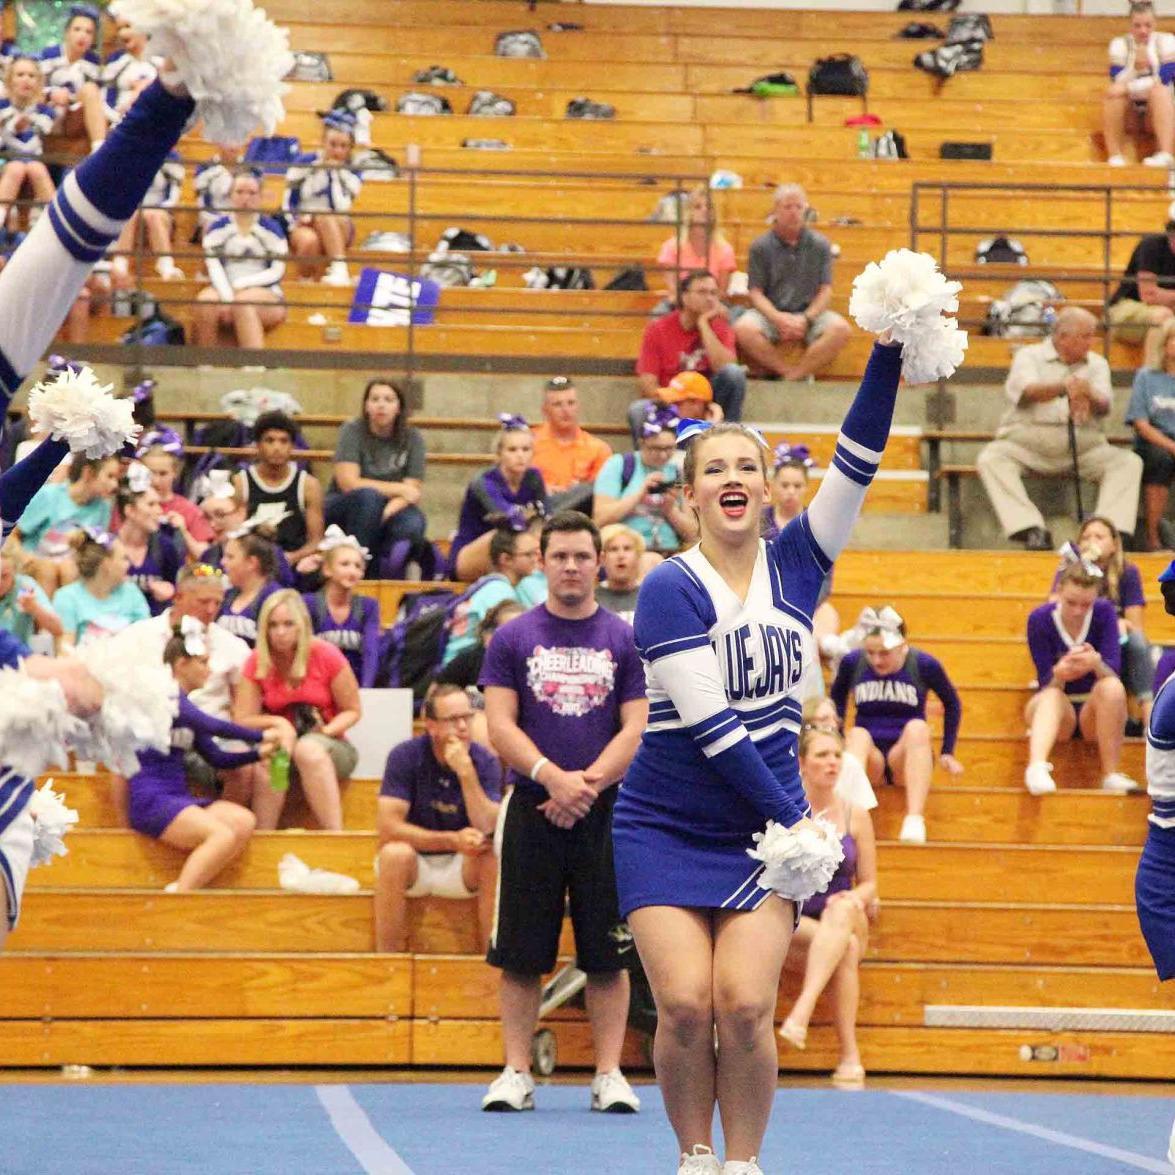 JV WHS Cheer